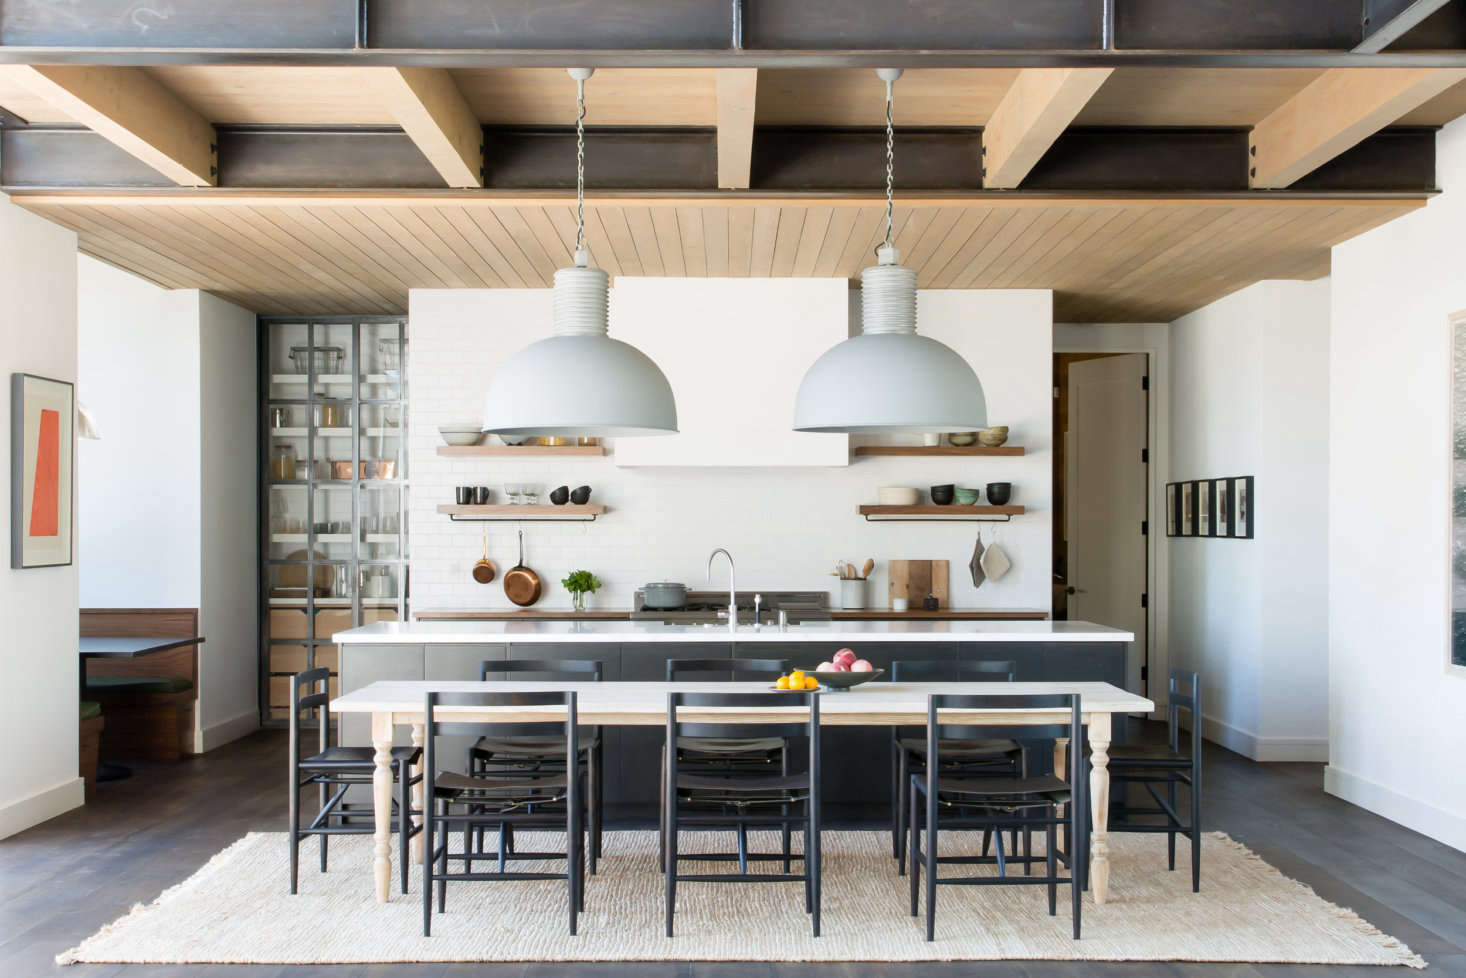 Trend Alert 7 Oversized Sculptural Kitchen Dining Pendants Remodelista